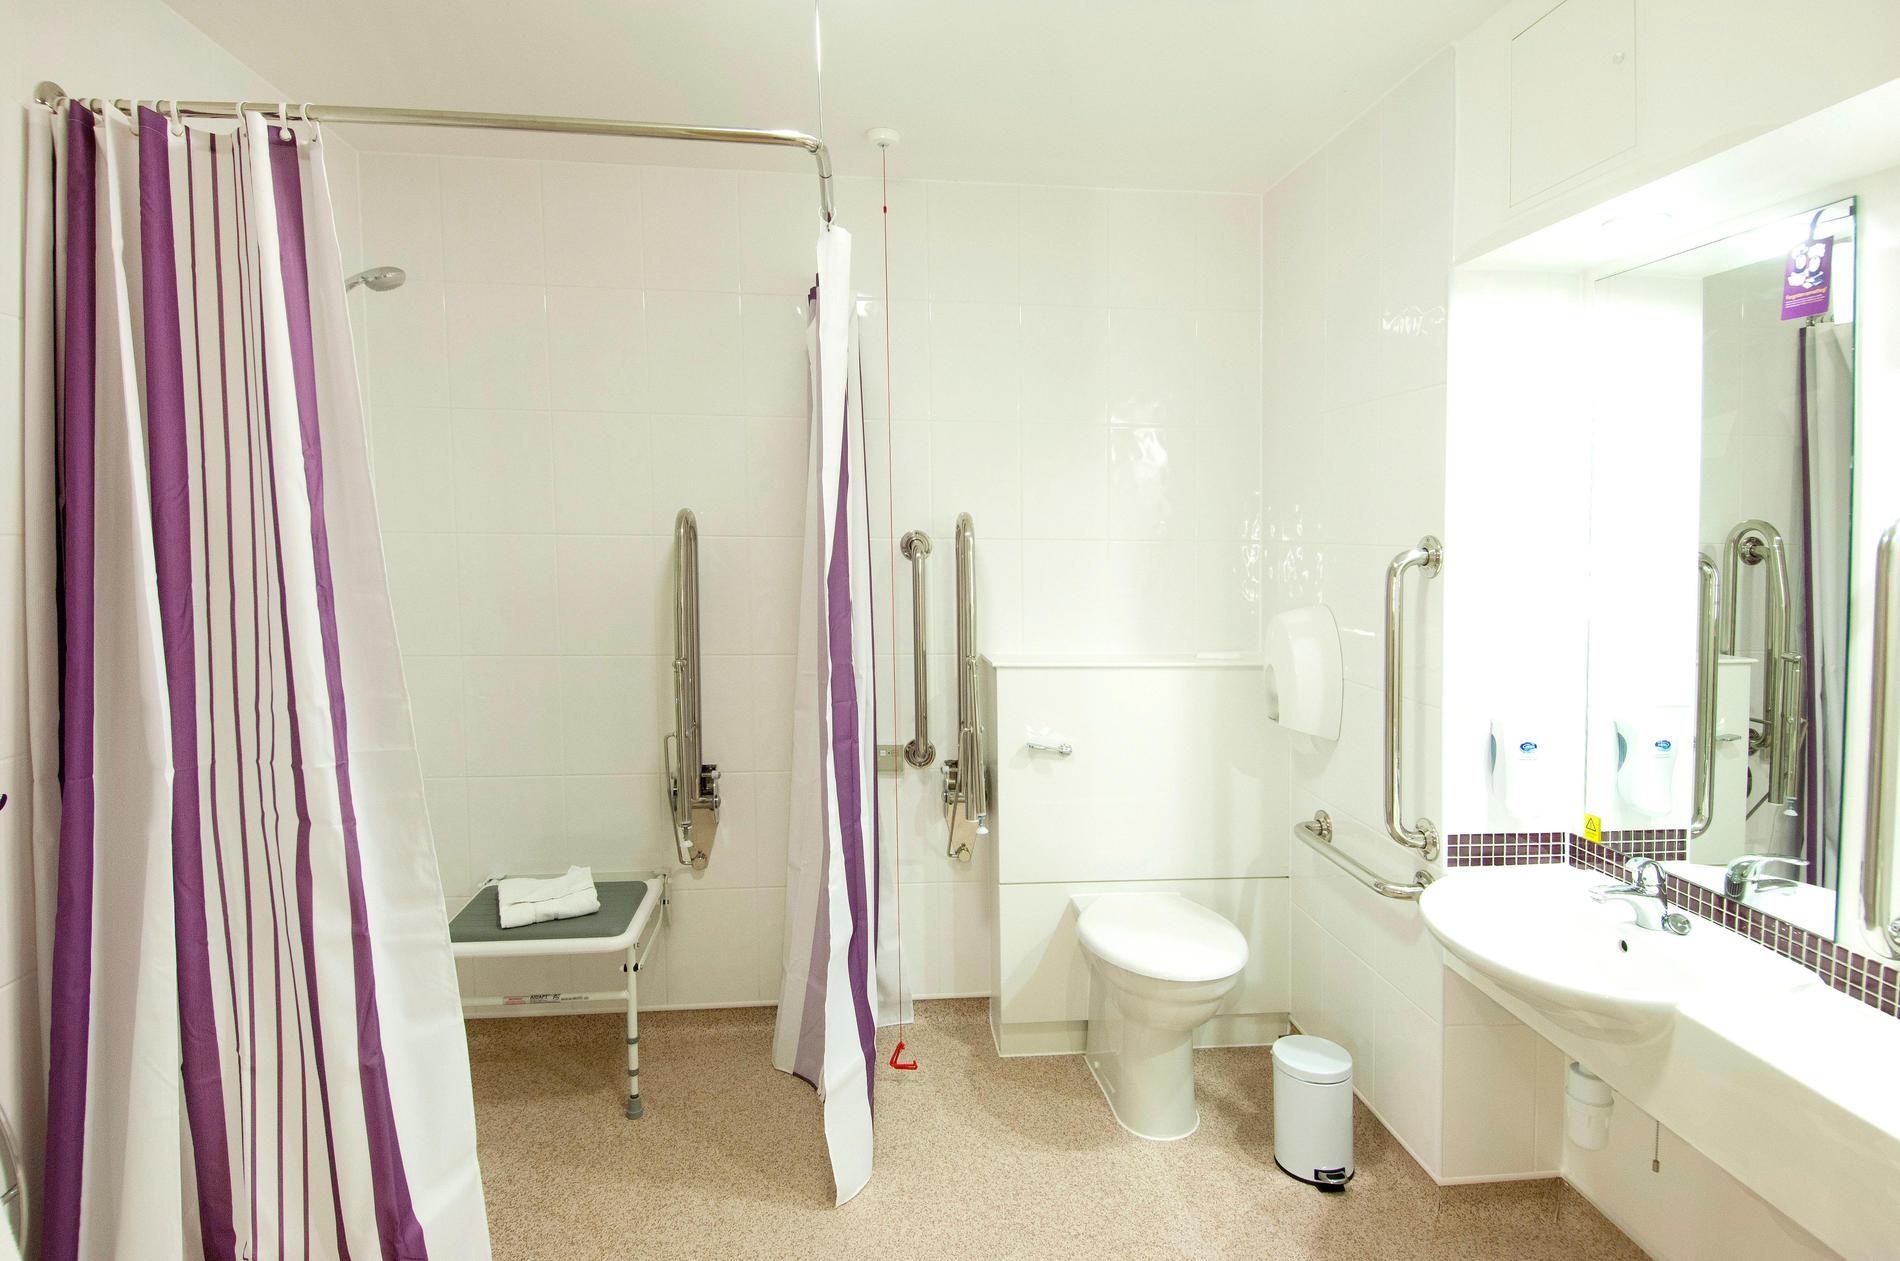 Premier Inn accessible bathroom/wetroom with walk-in shower